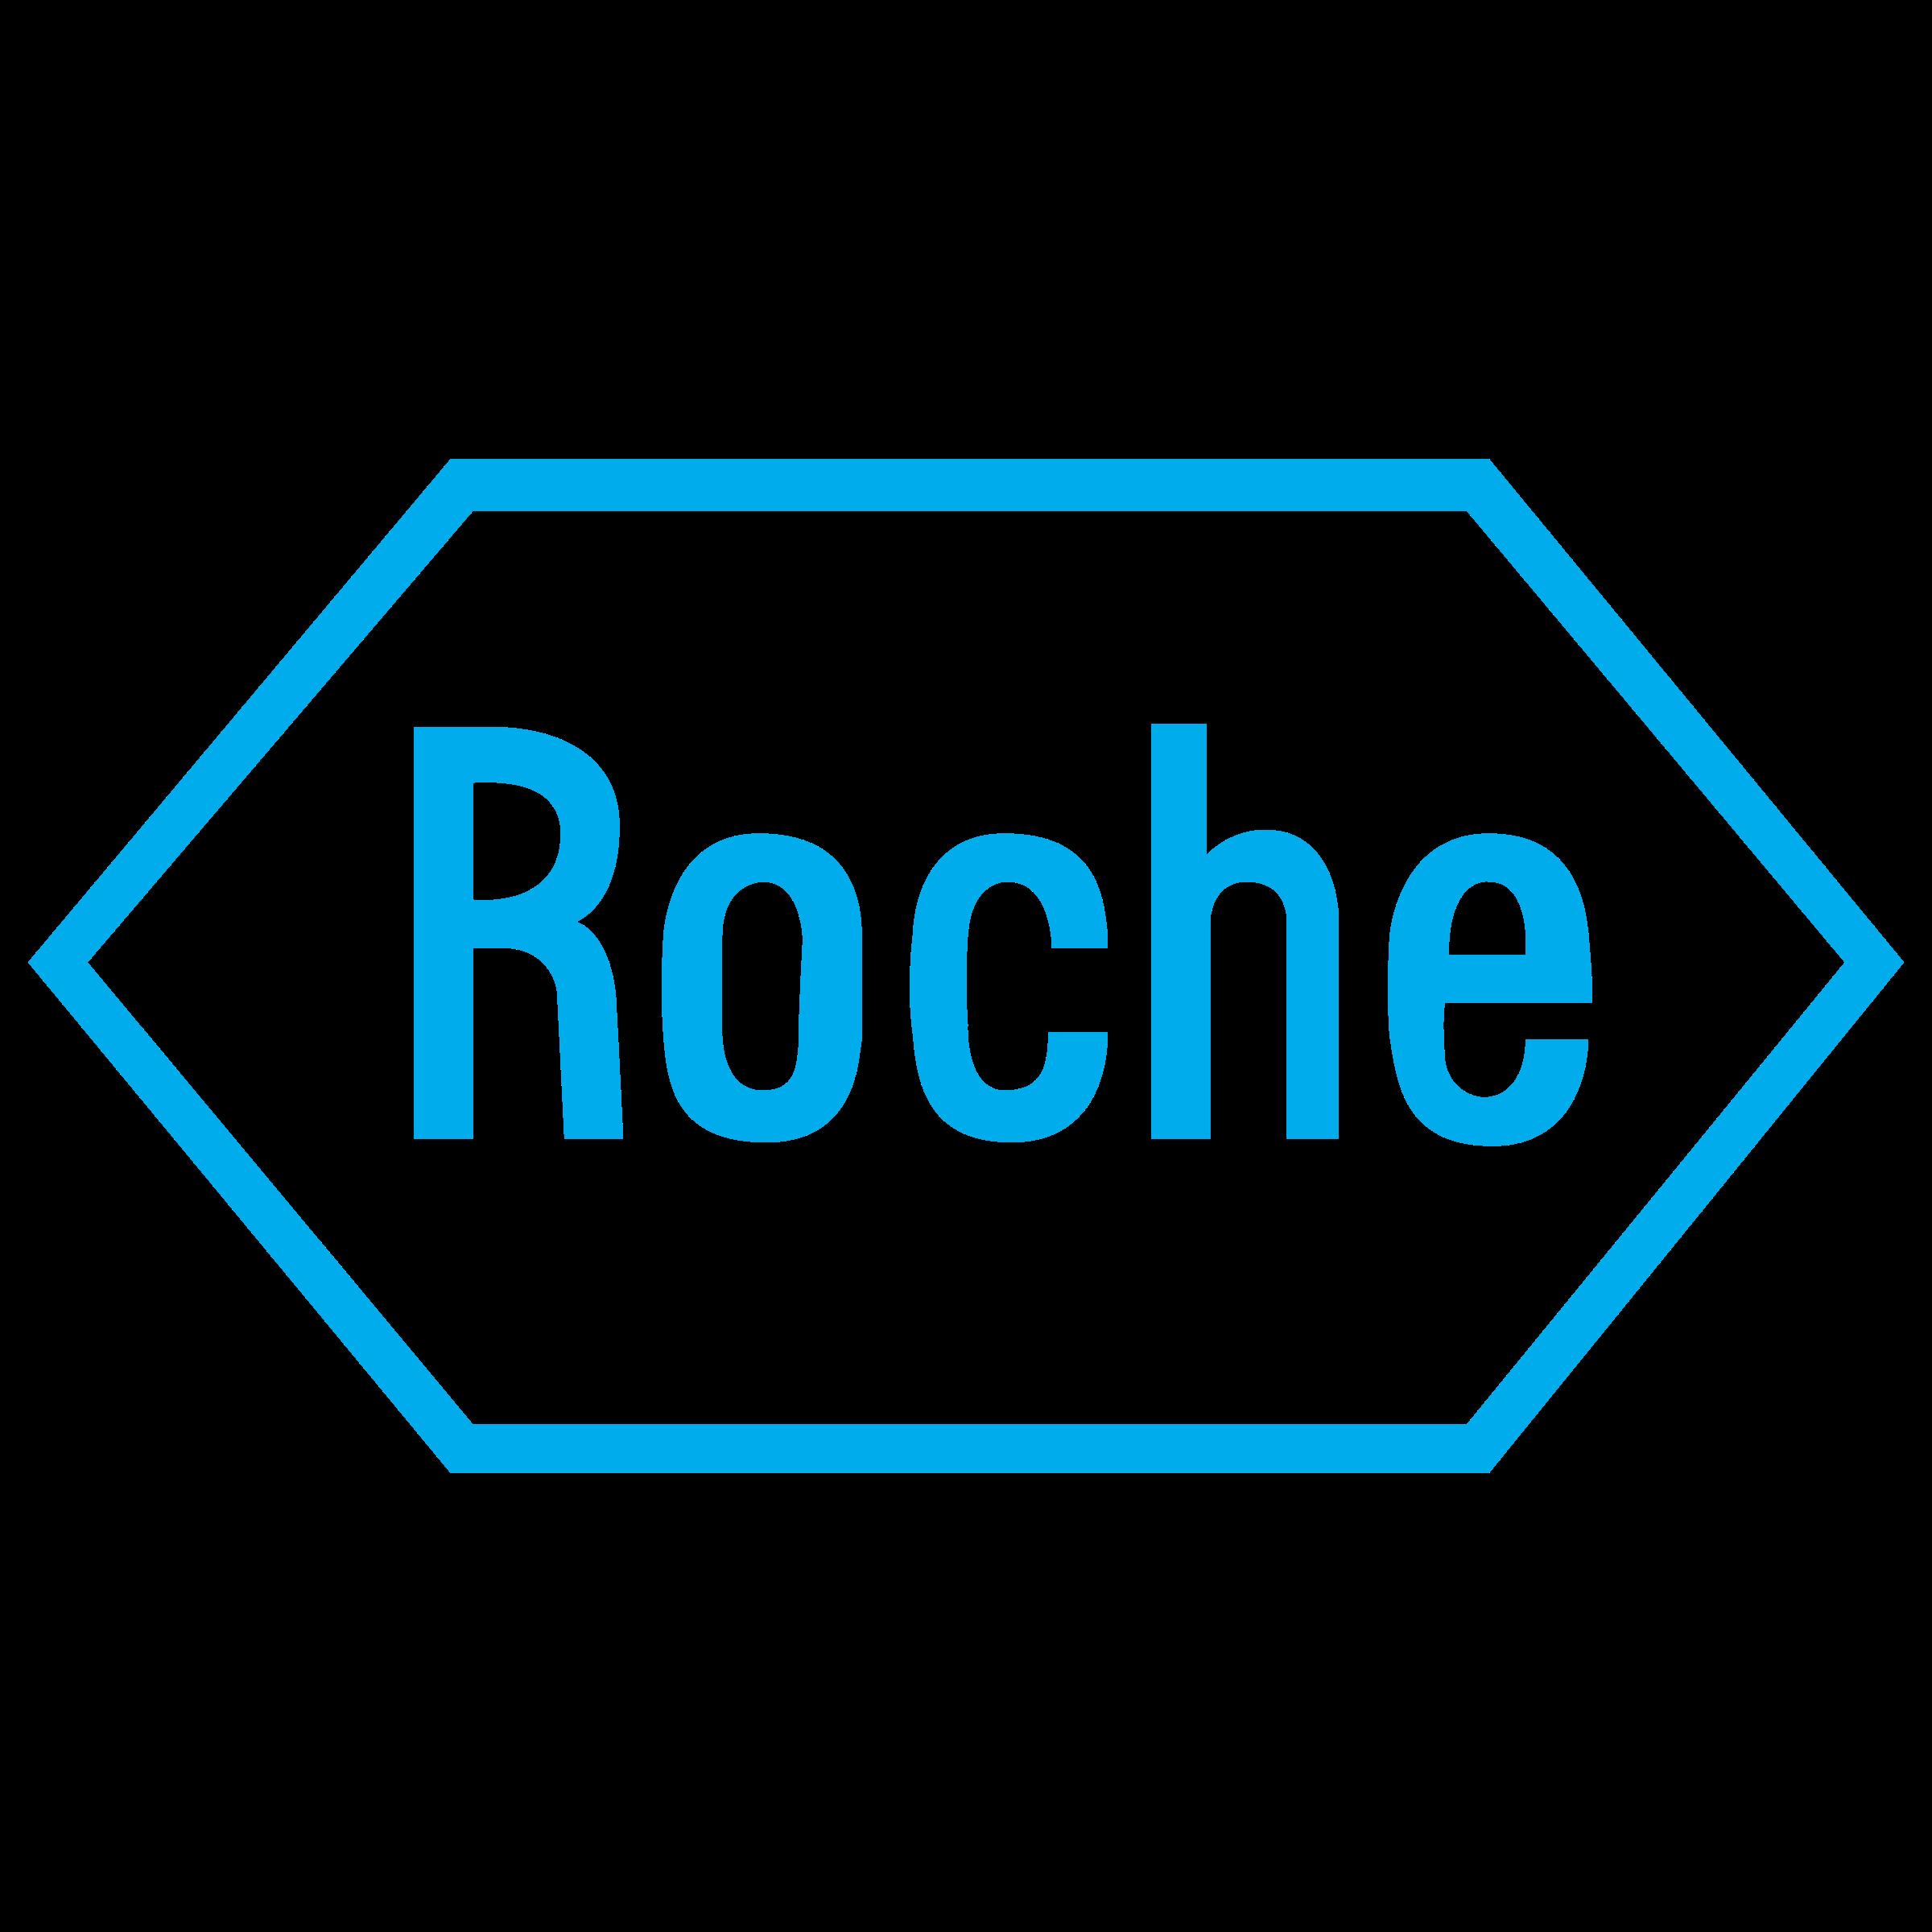 roche-logo-png-transparent.png